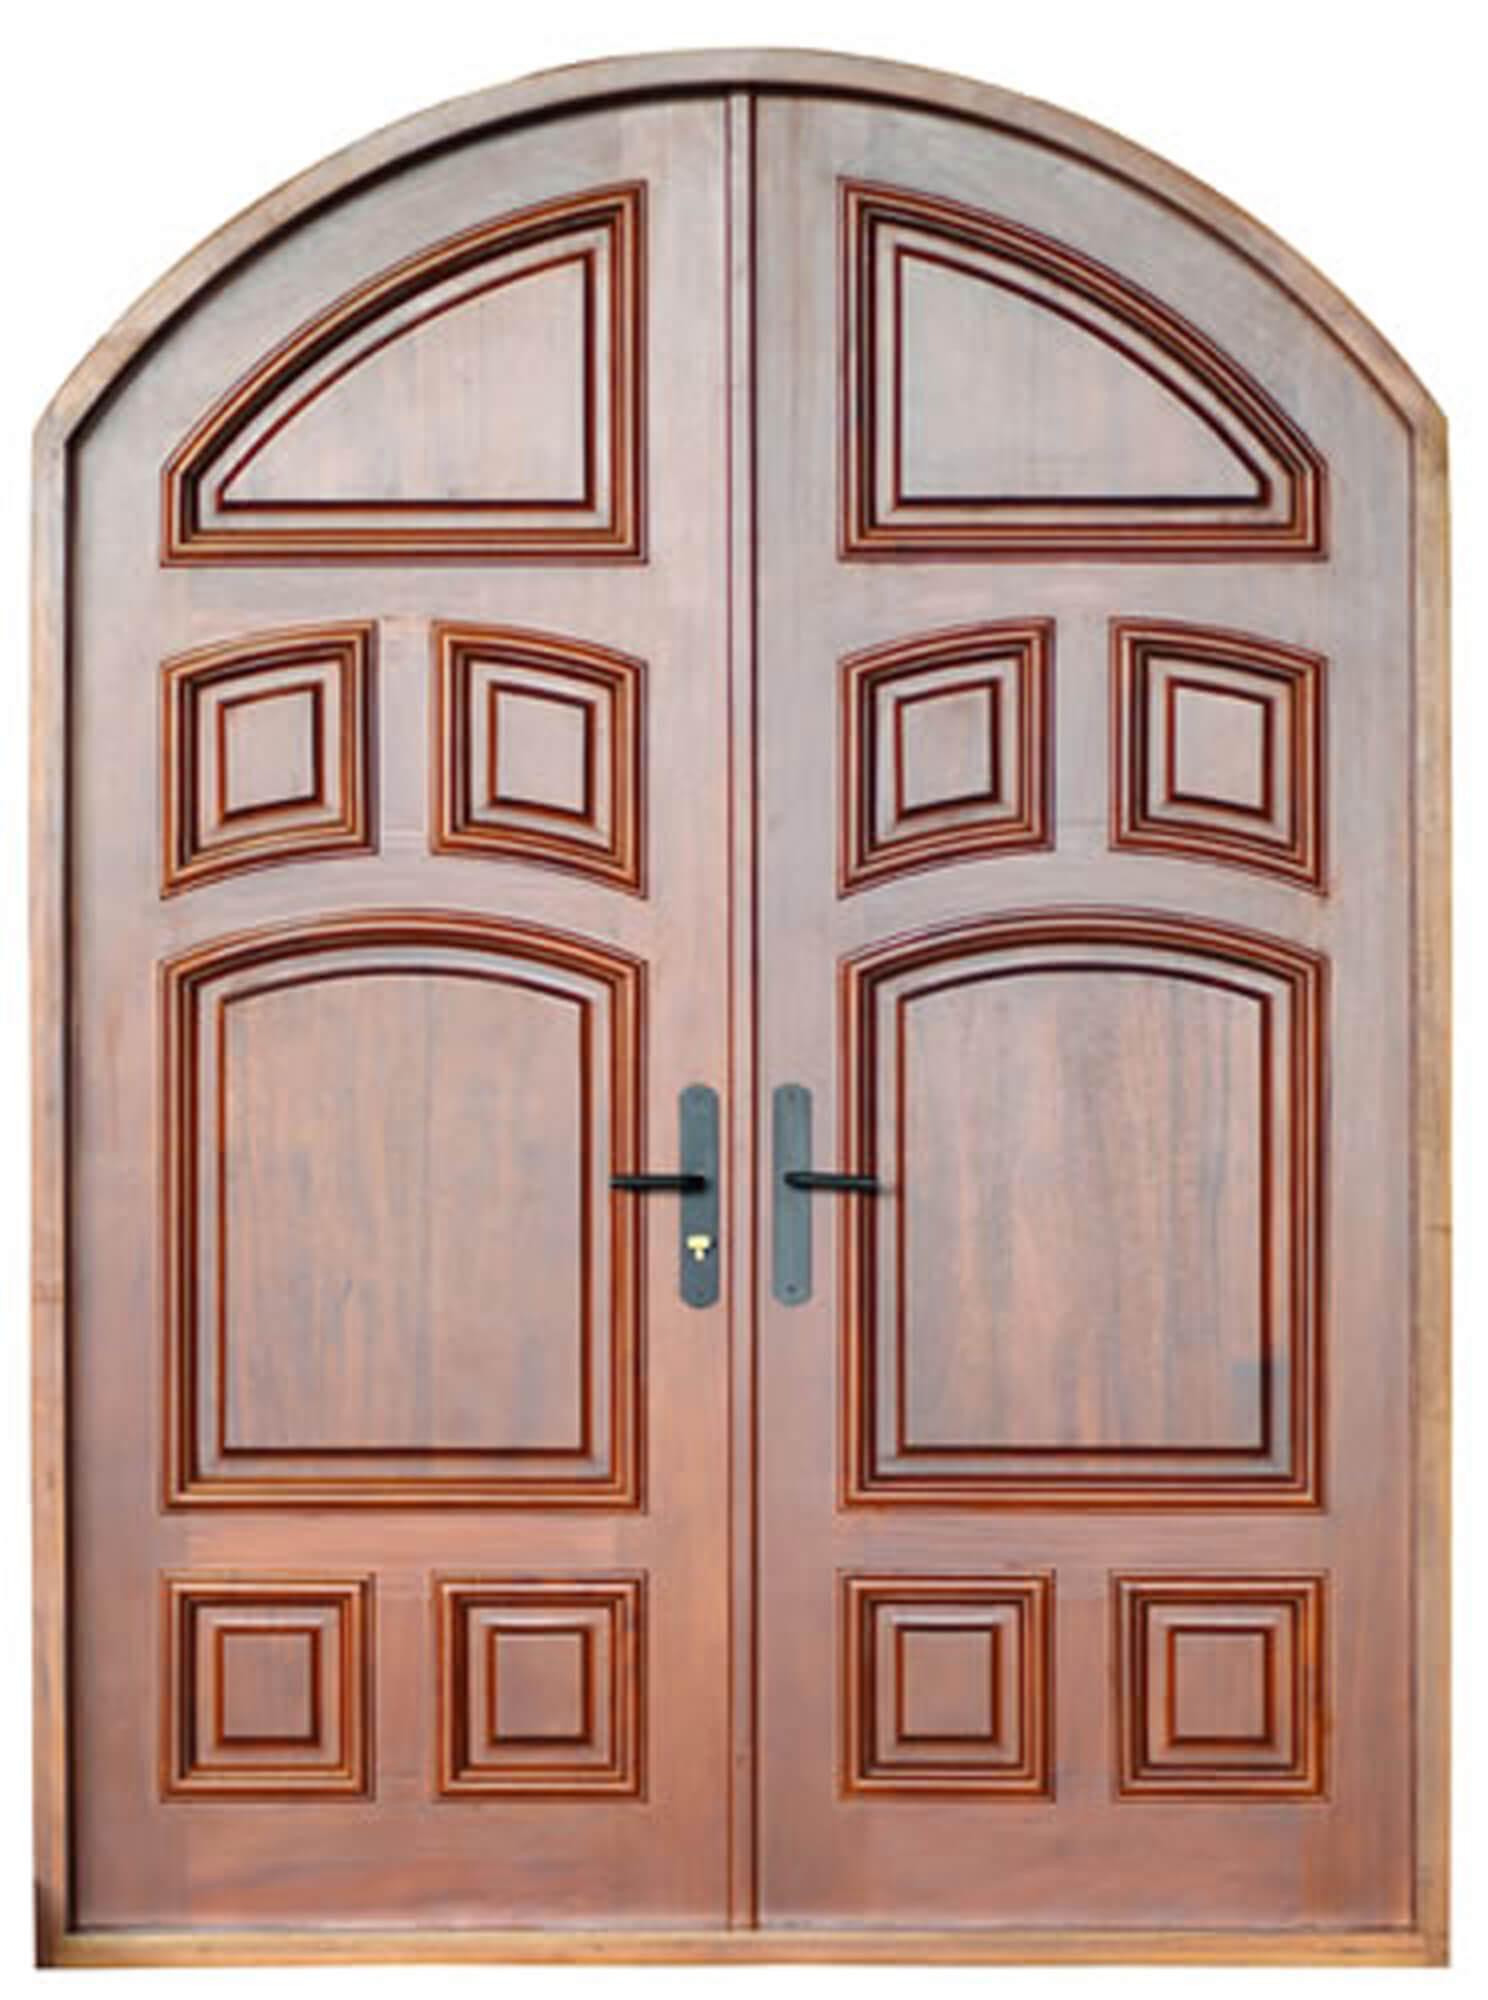 INDIAN CREEK VILLAGE. MAHOGANY CARVED DOORS INTERIOR.